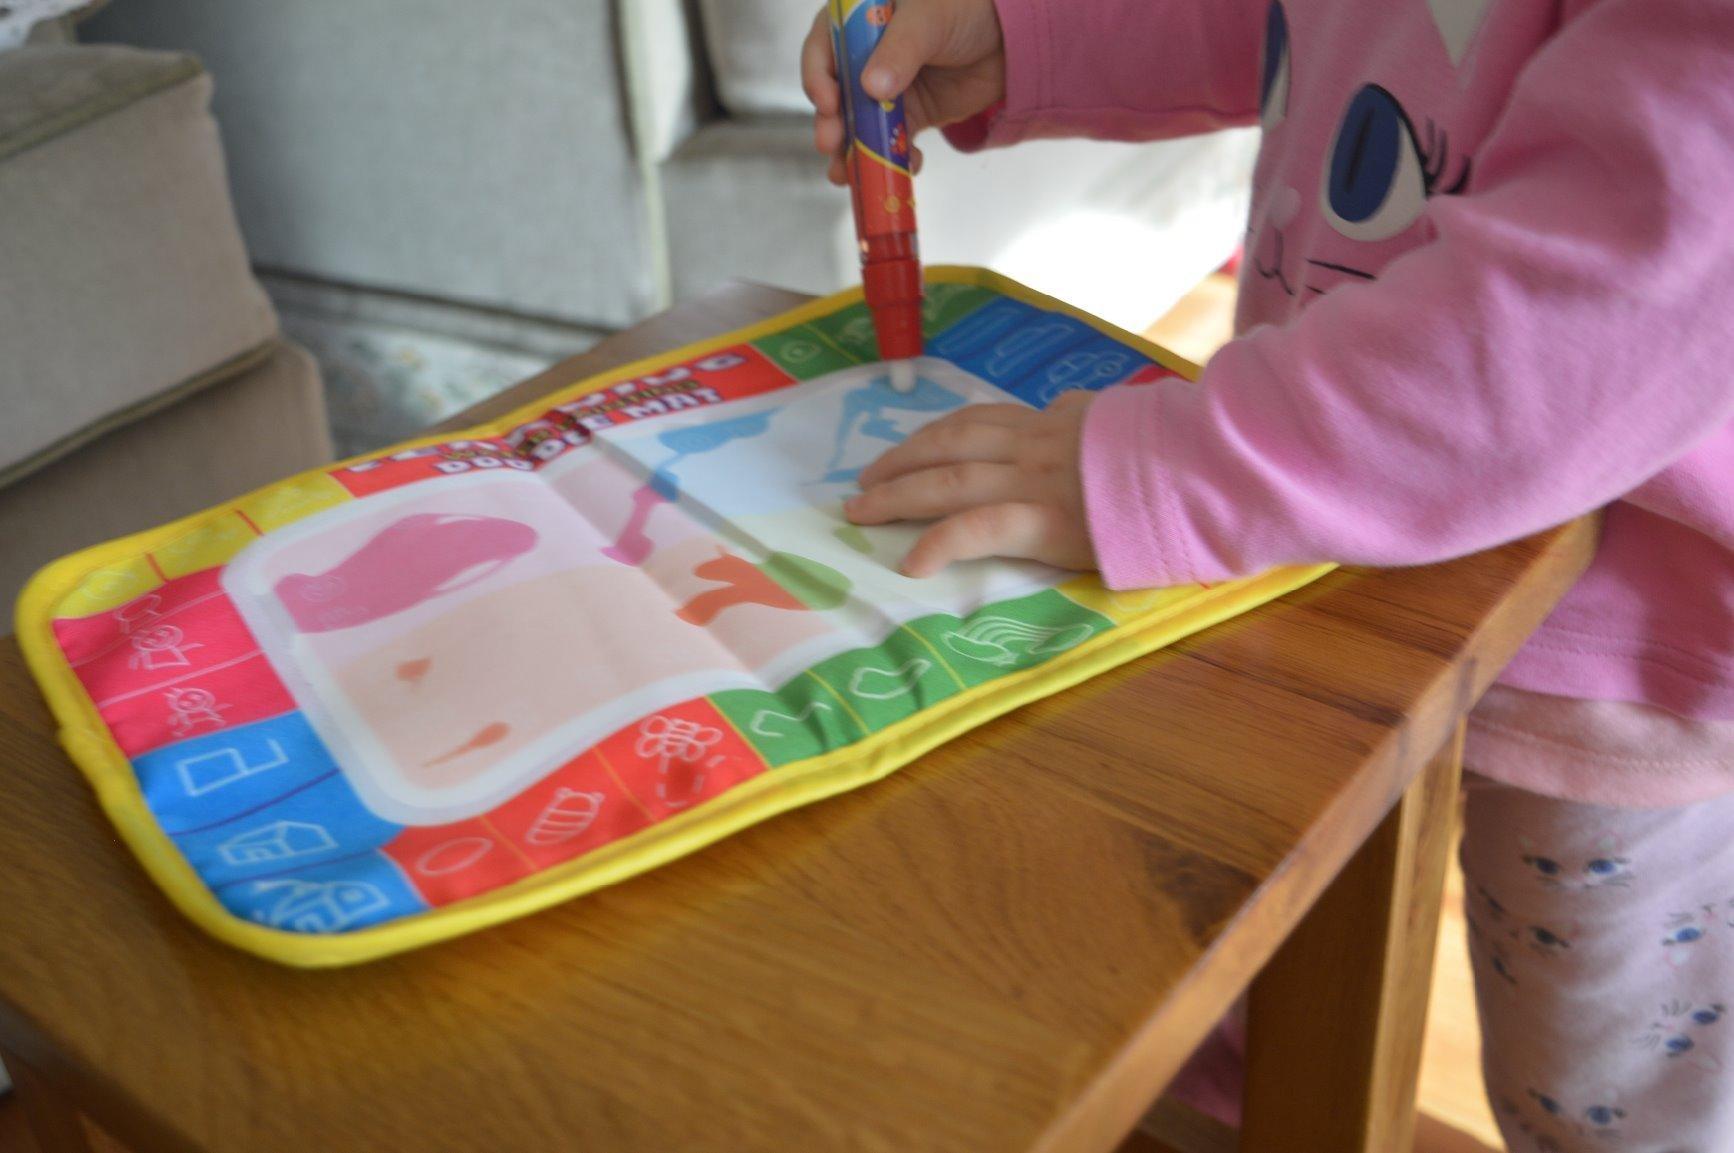 Christmas Gift, Tonsee 29X19cm Kids Water Drawing Painting Writing Mat Board & Magic Pen